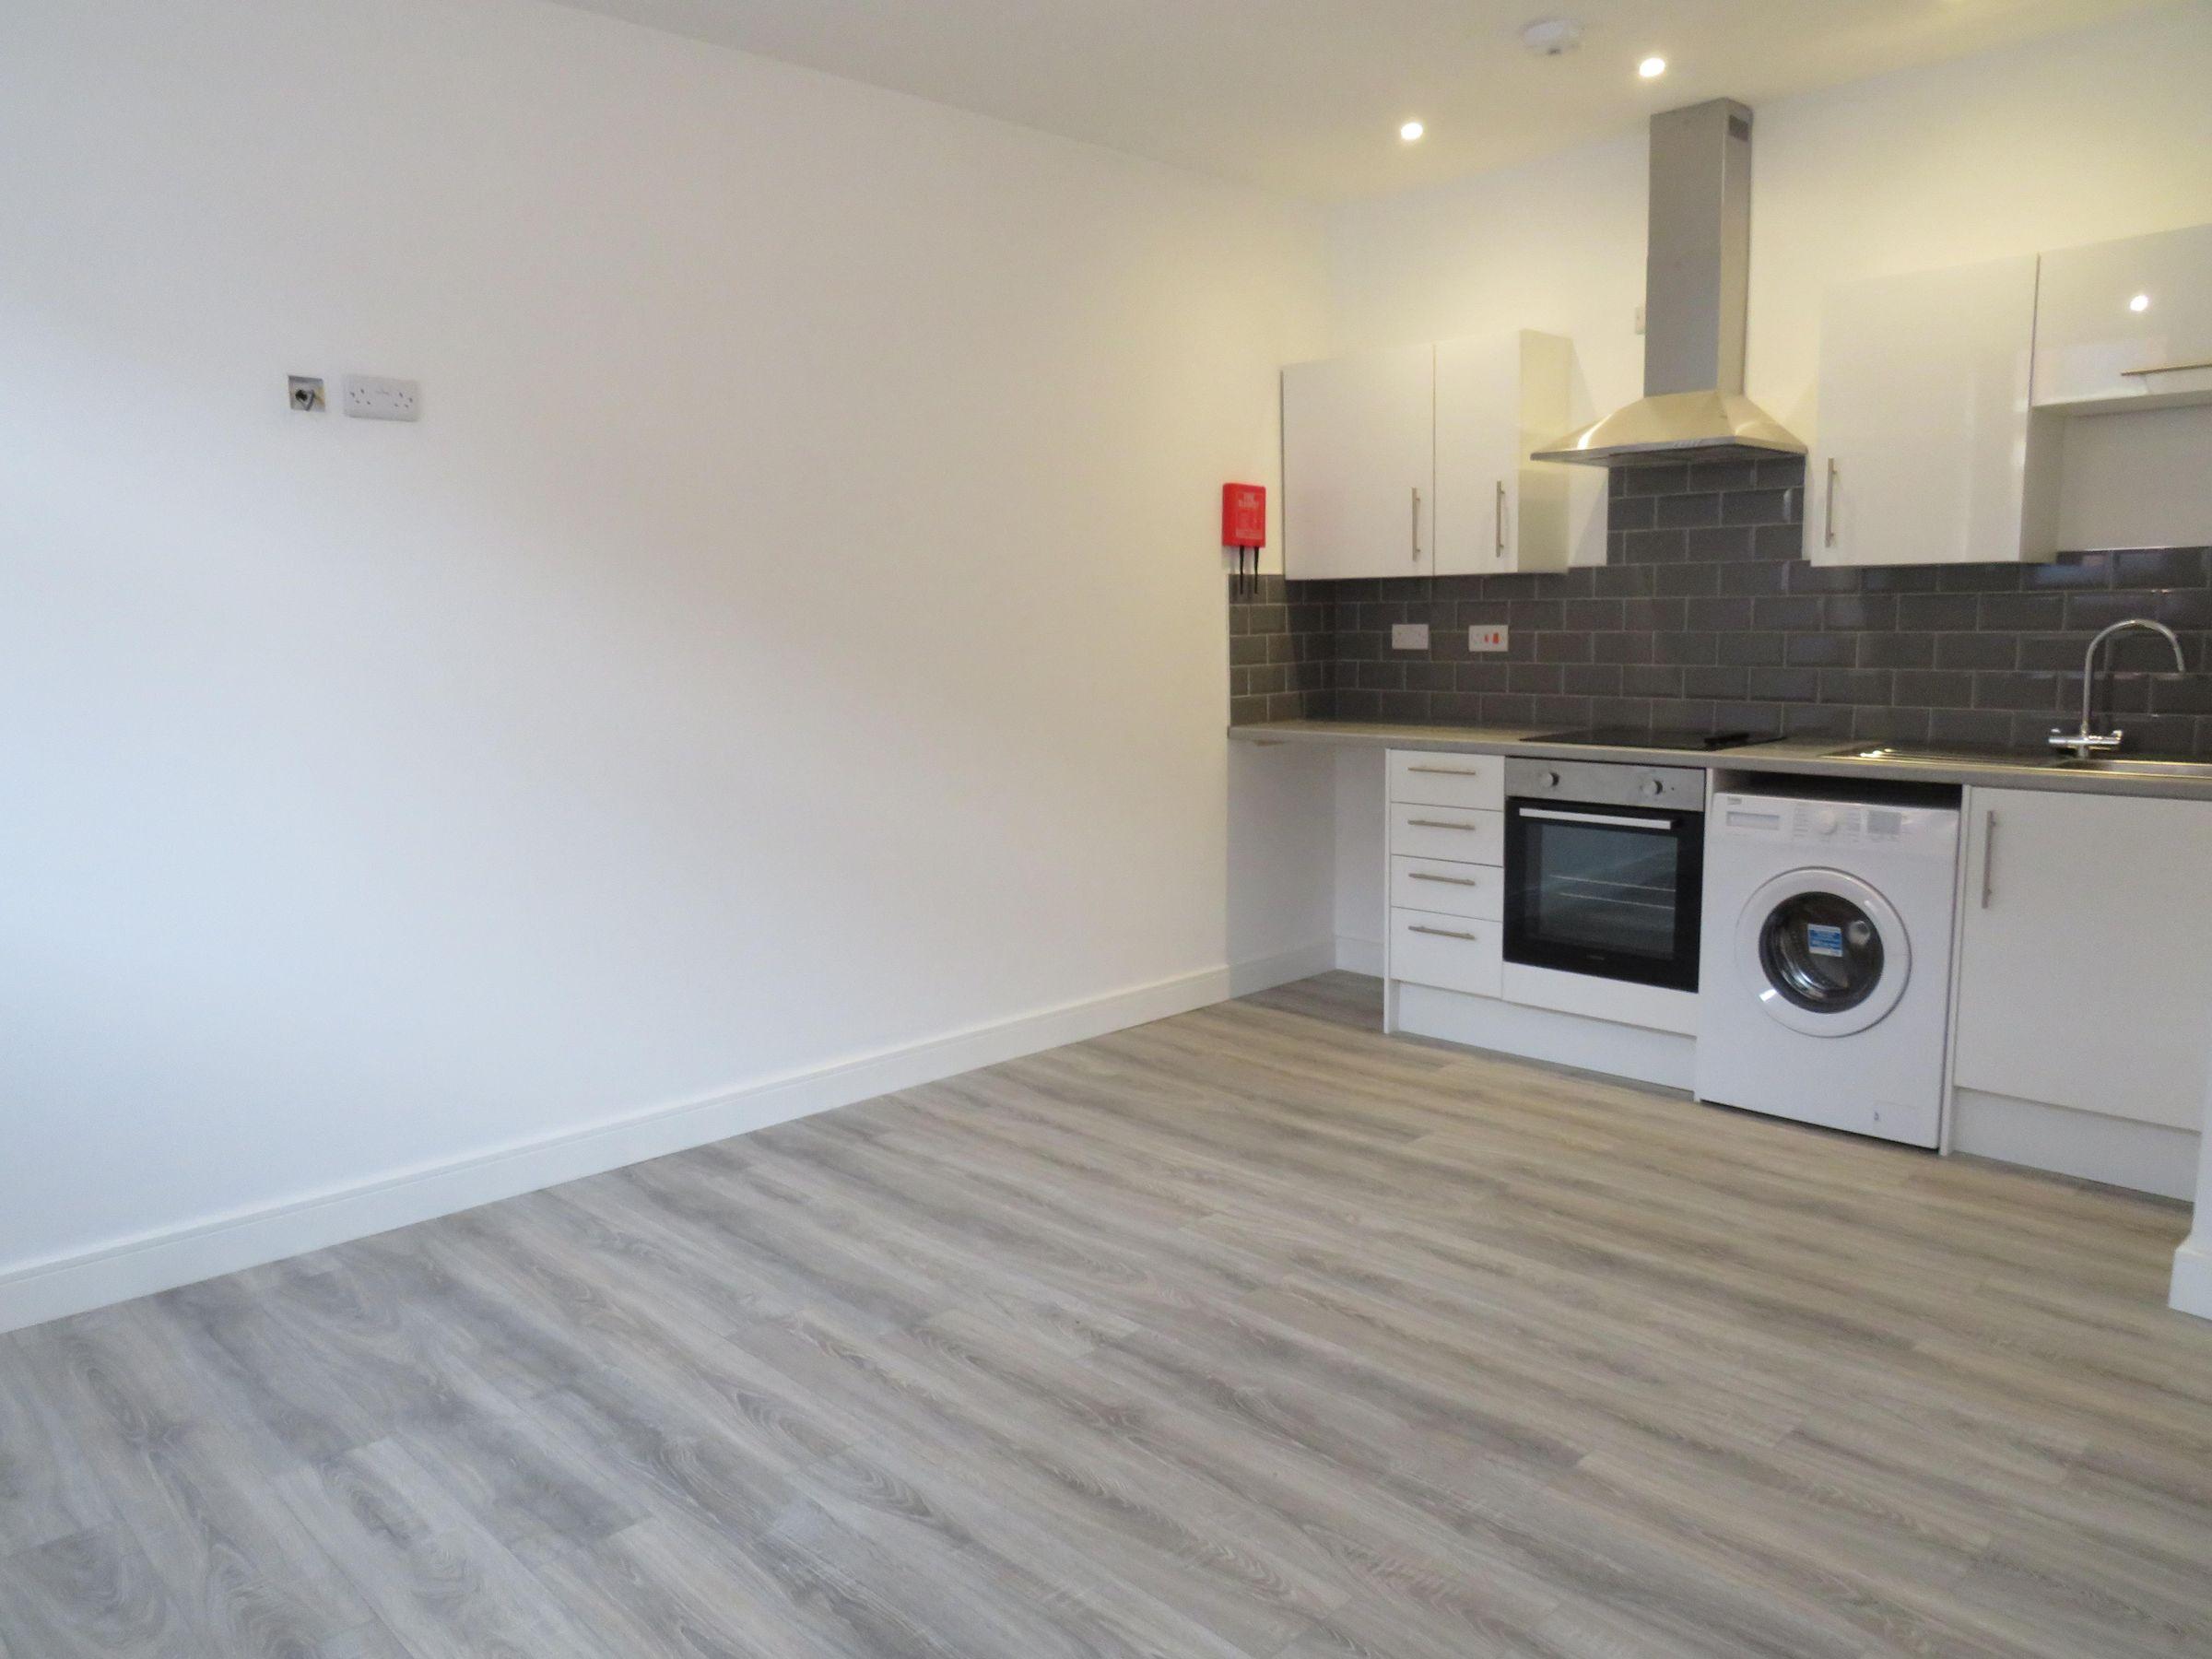 Property photo 1 of 6. Kitchen